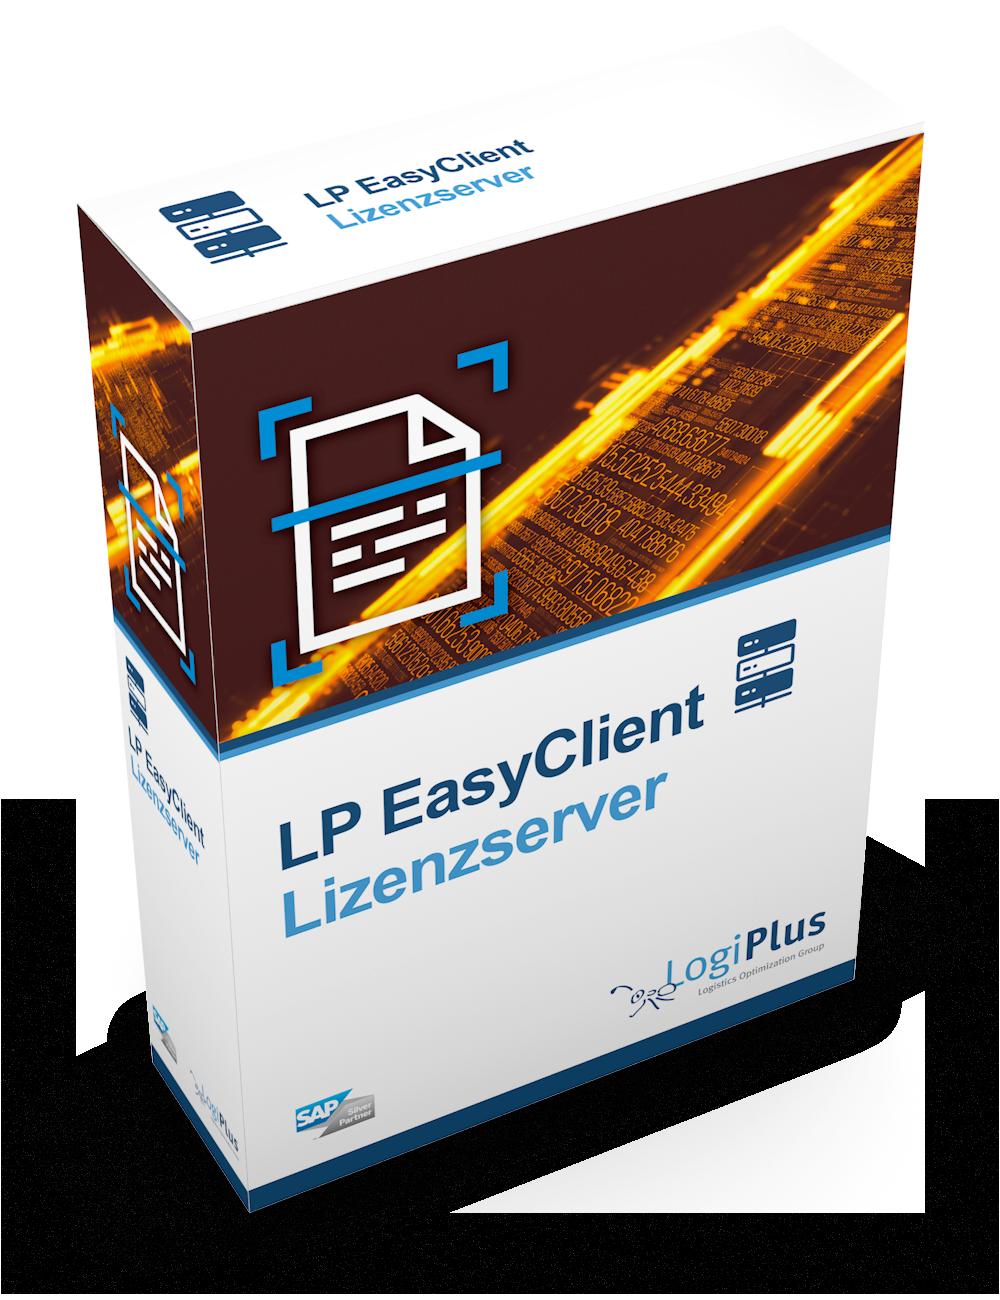 LP EasyClient NG Lizenzserver